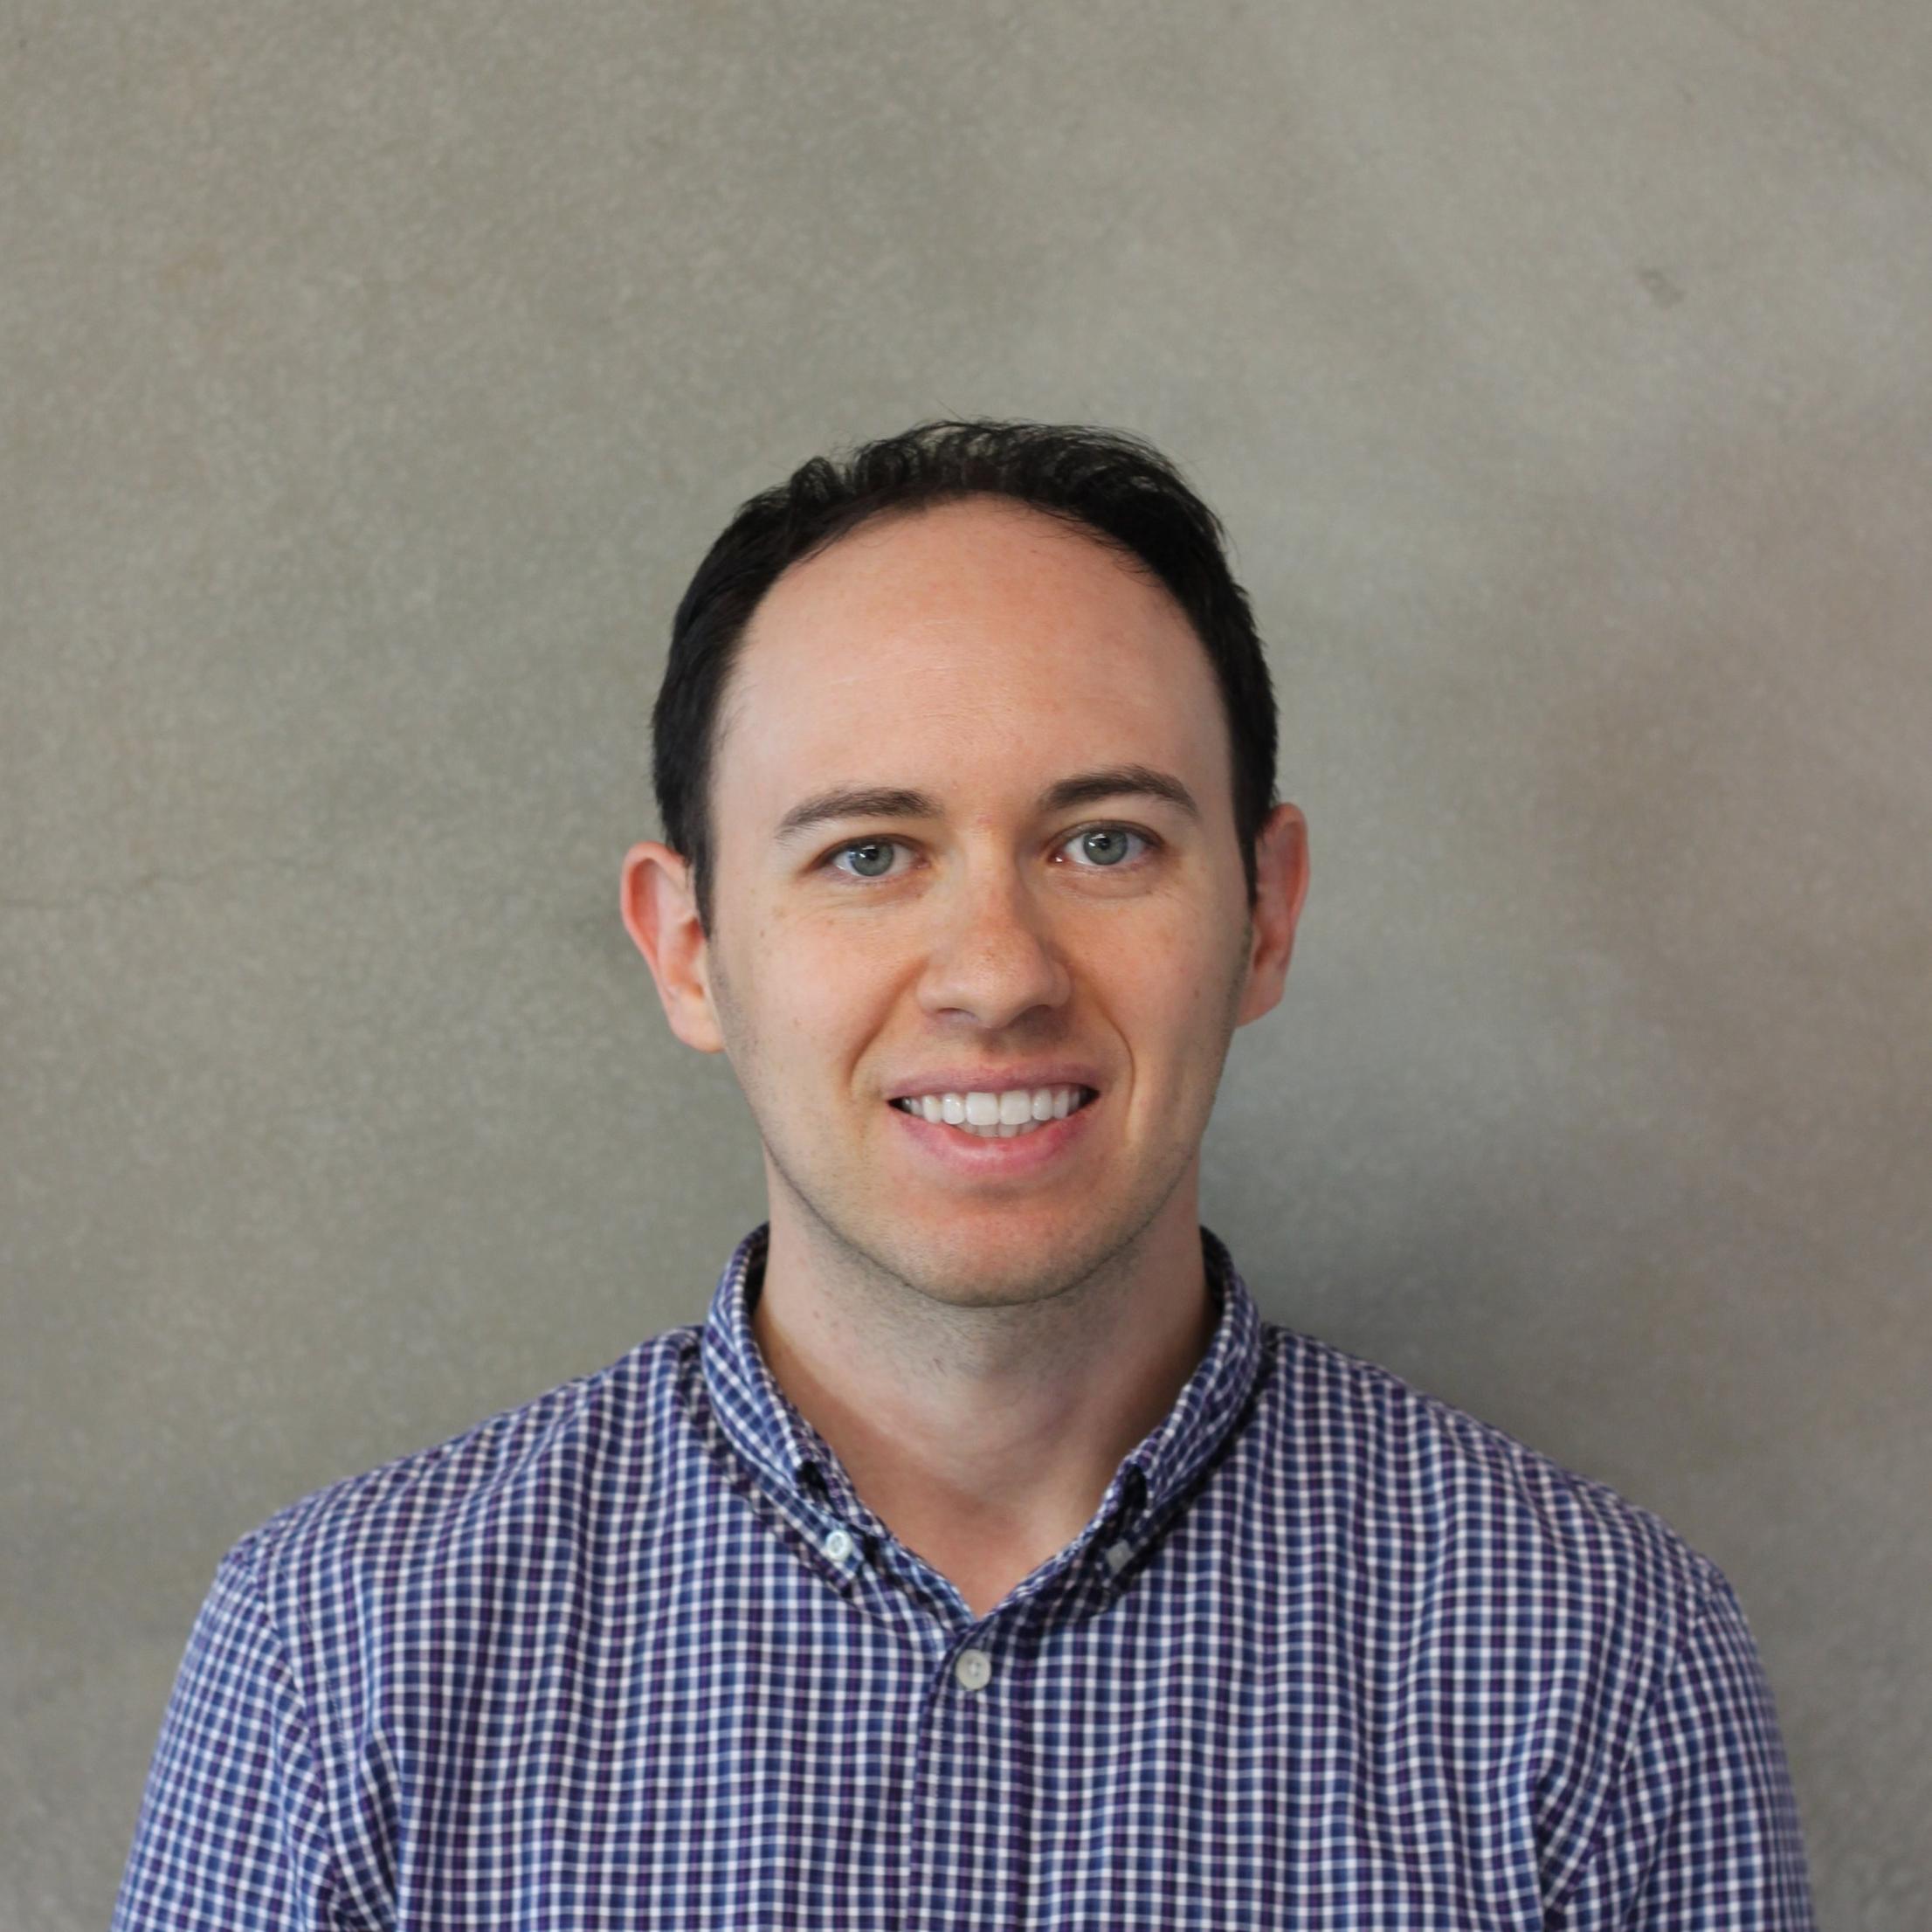 Max Mednik - Chief Operating Officer, Co-FounderStanford B.S., M.S. | UCLA MBA | Google | 3x Entrepreneur